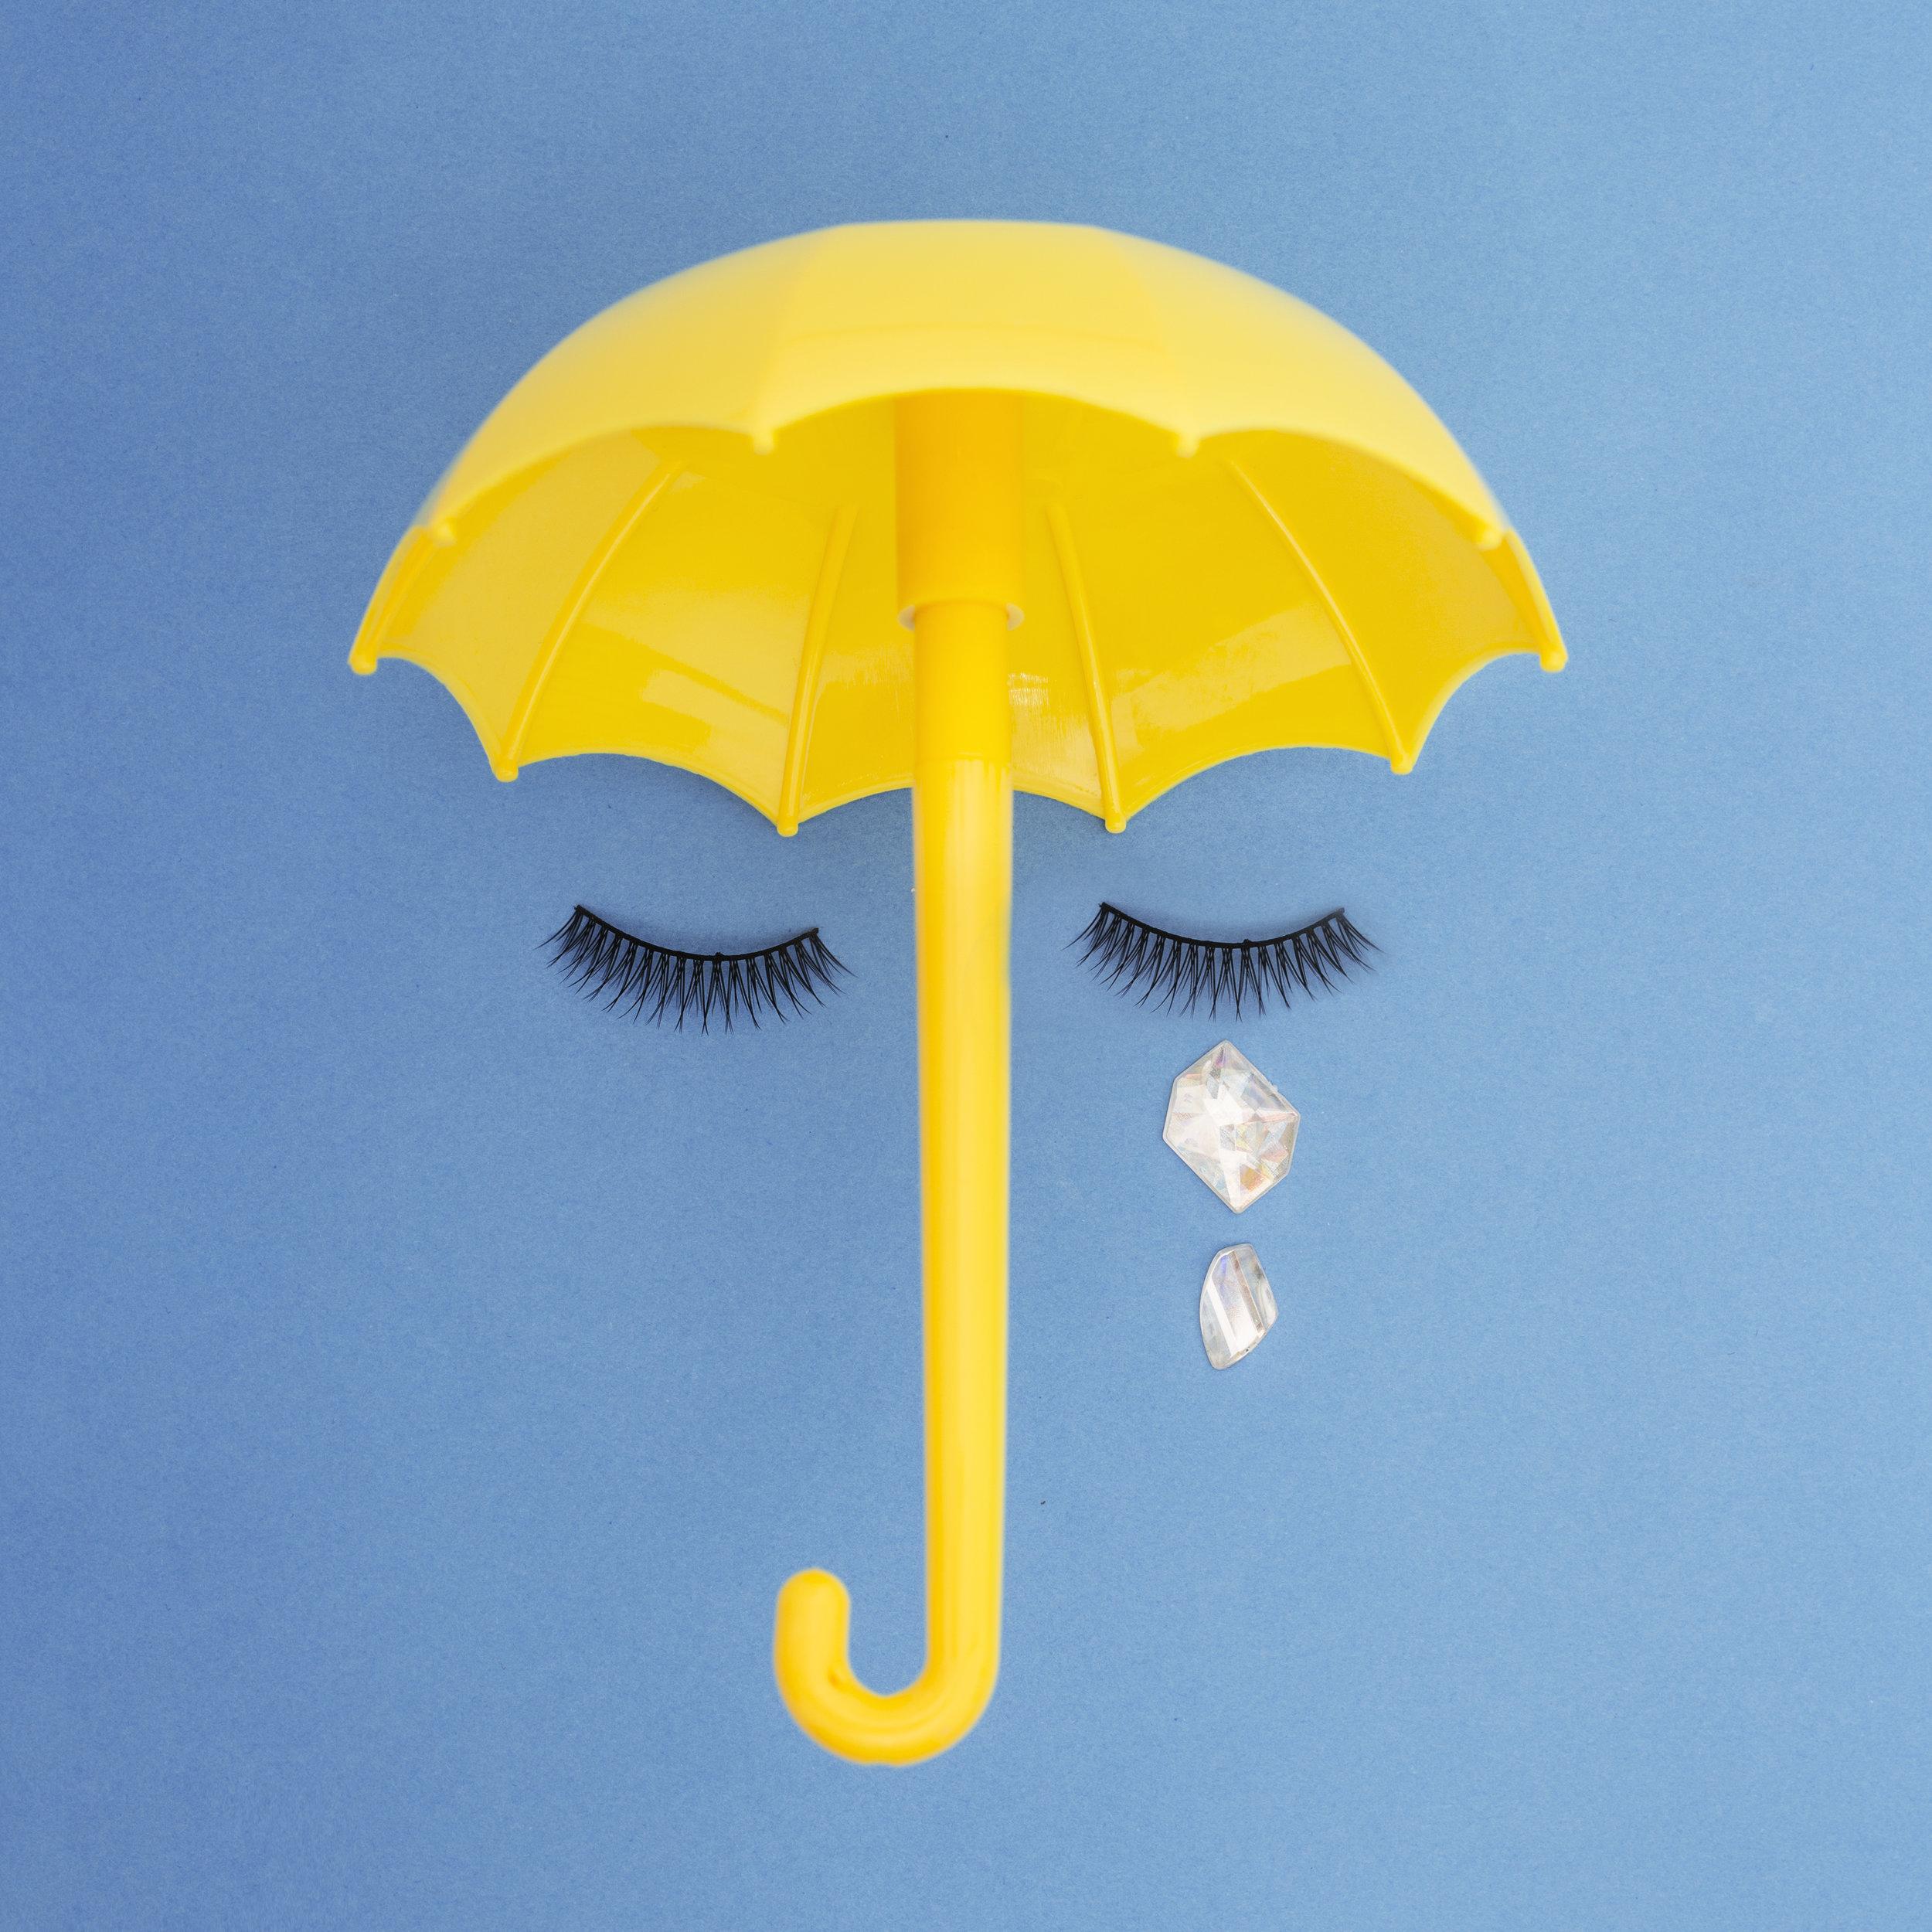 July 29th - Rain Day